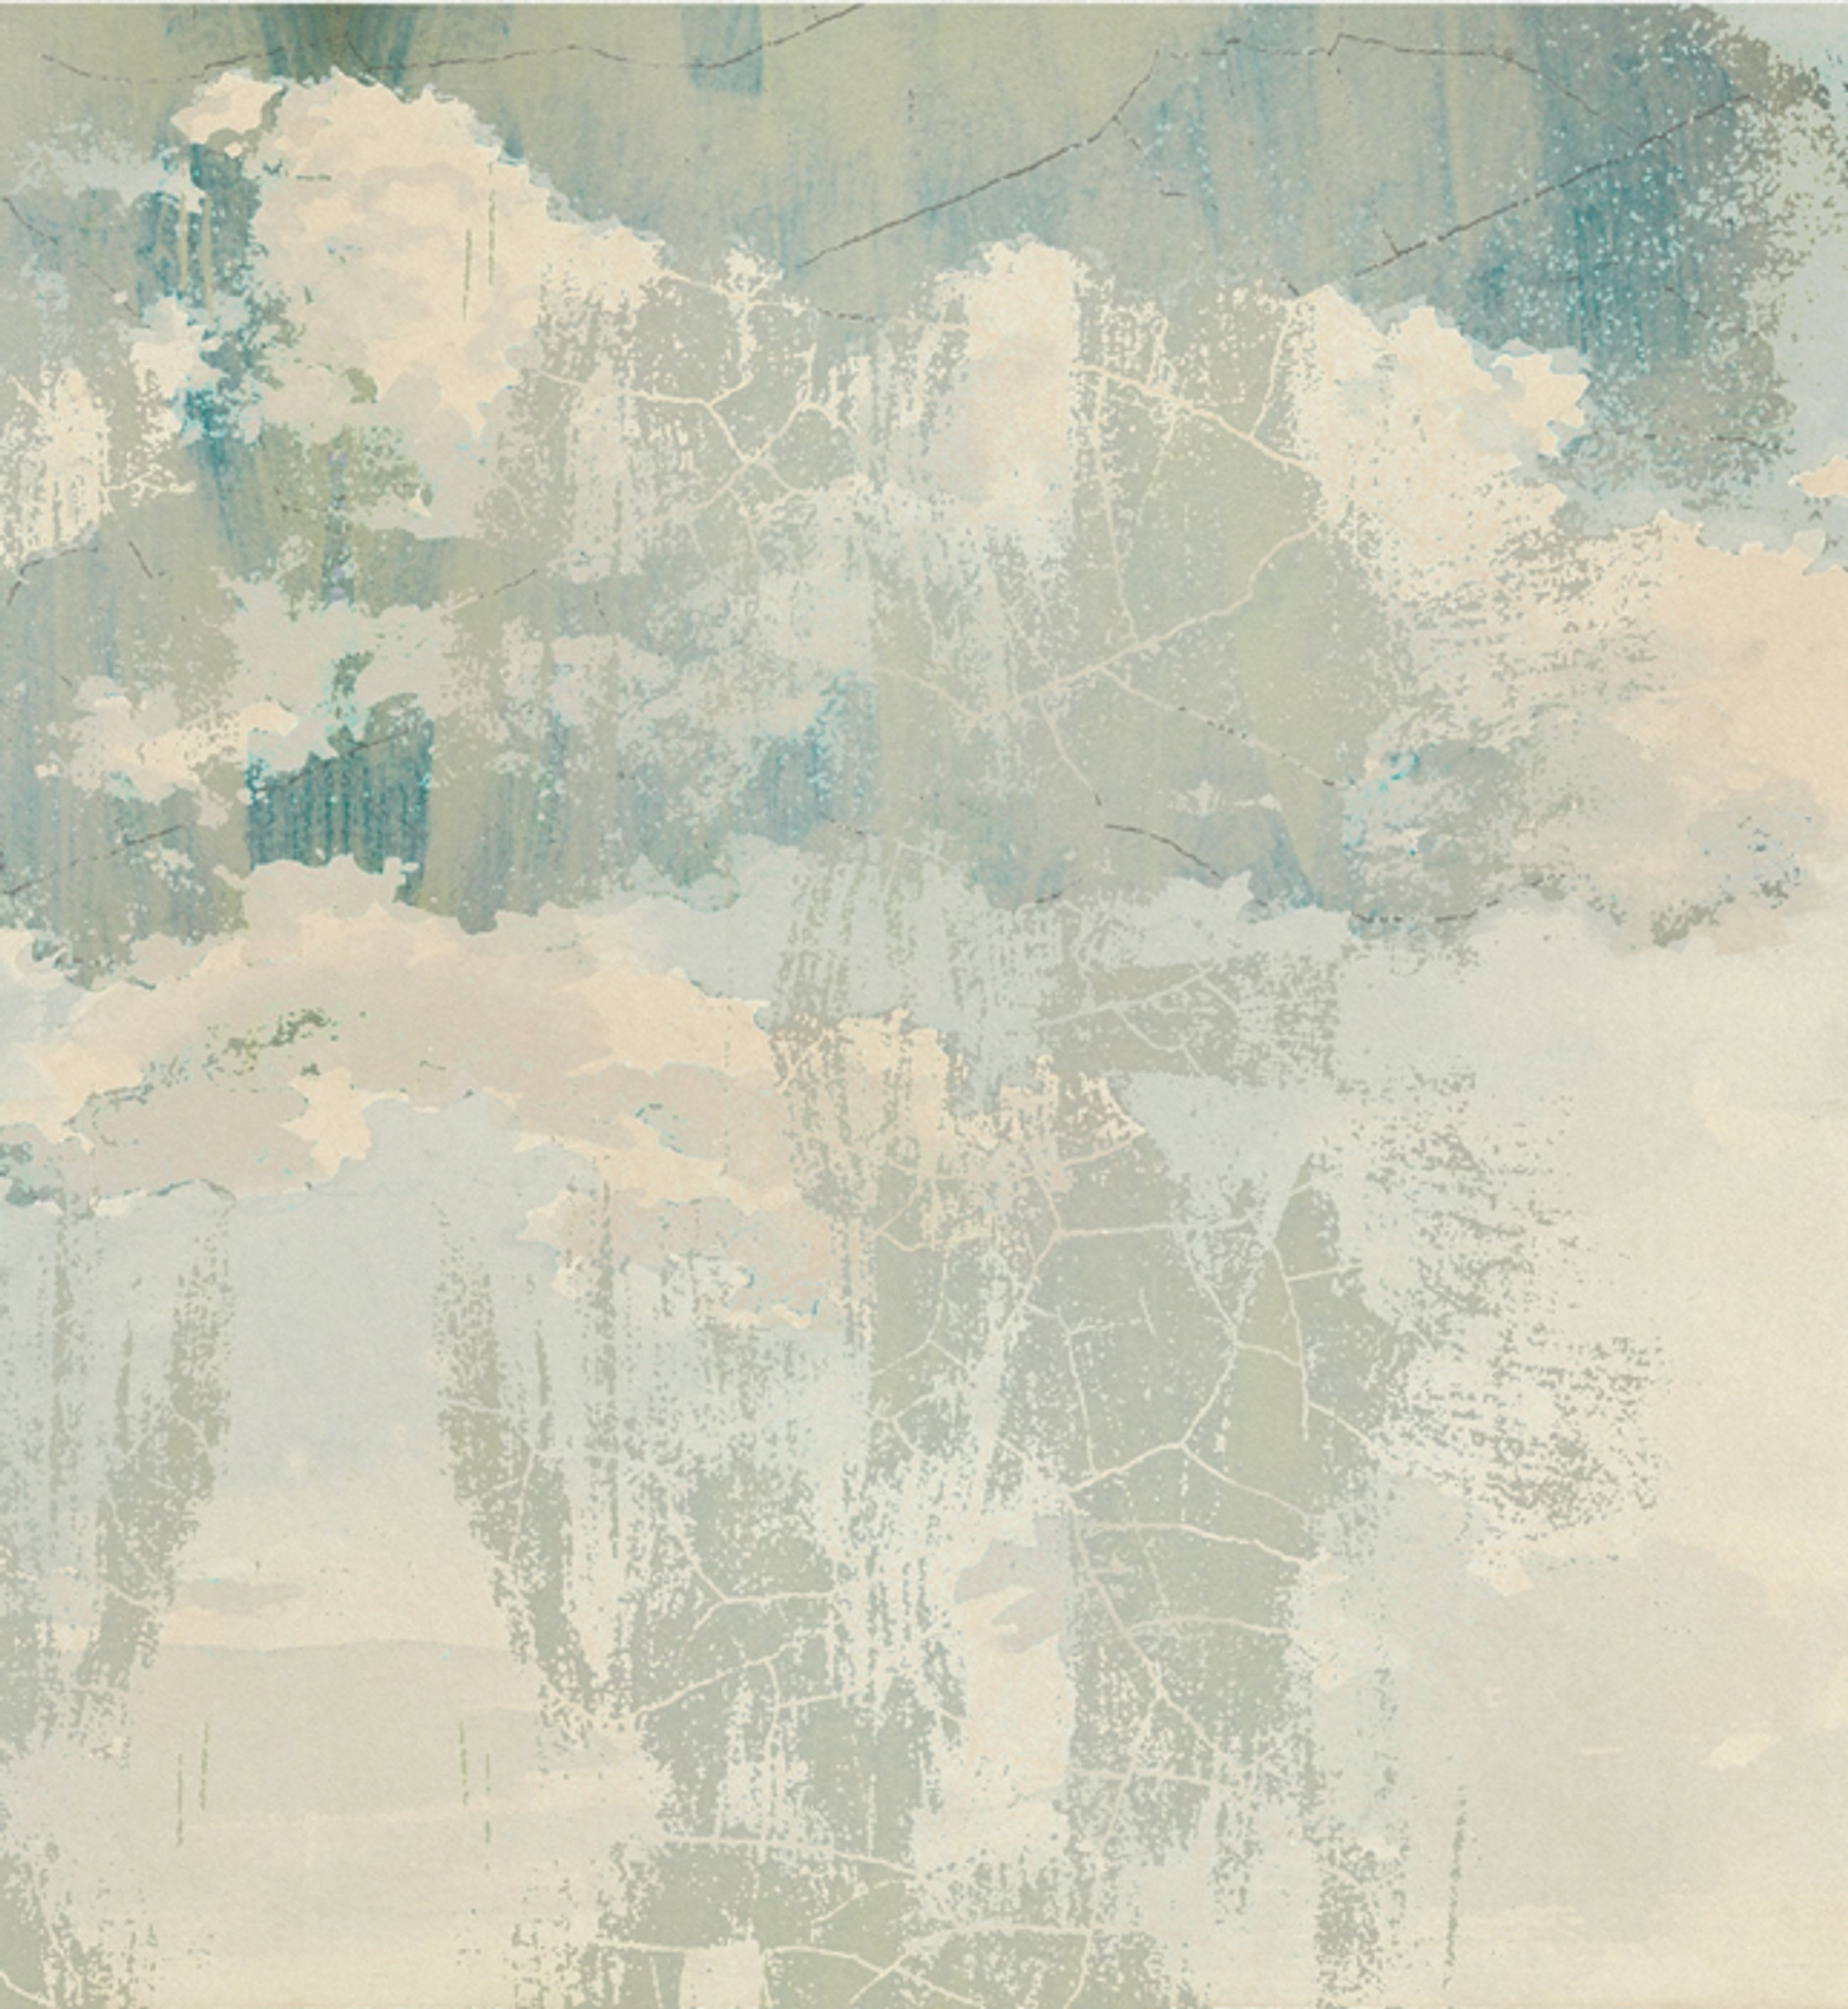 Wallpaper - Urban Sketches - Broken Clouds